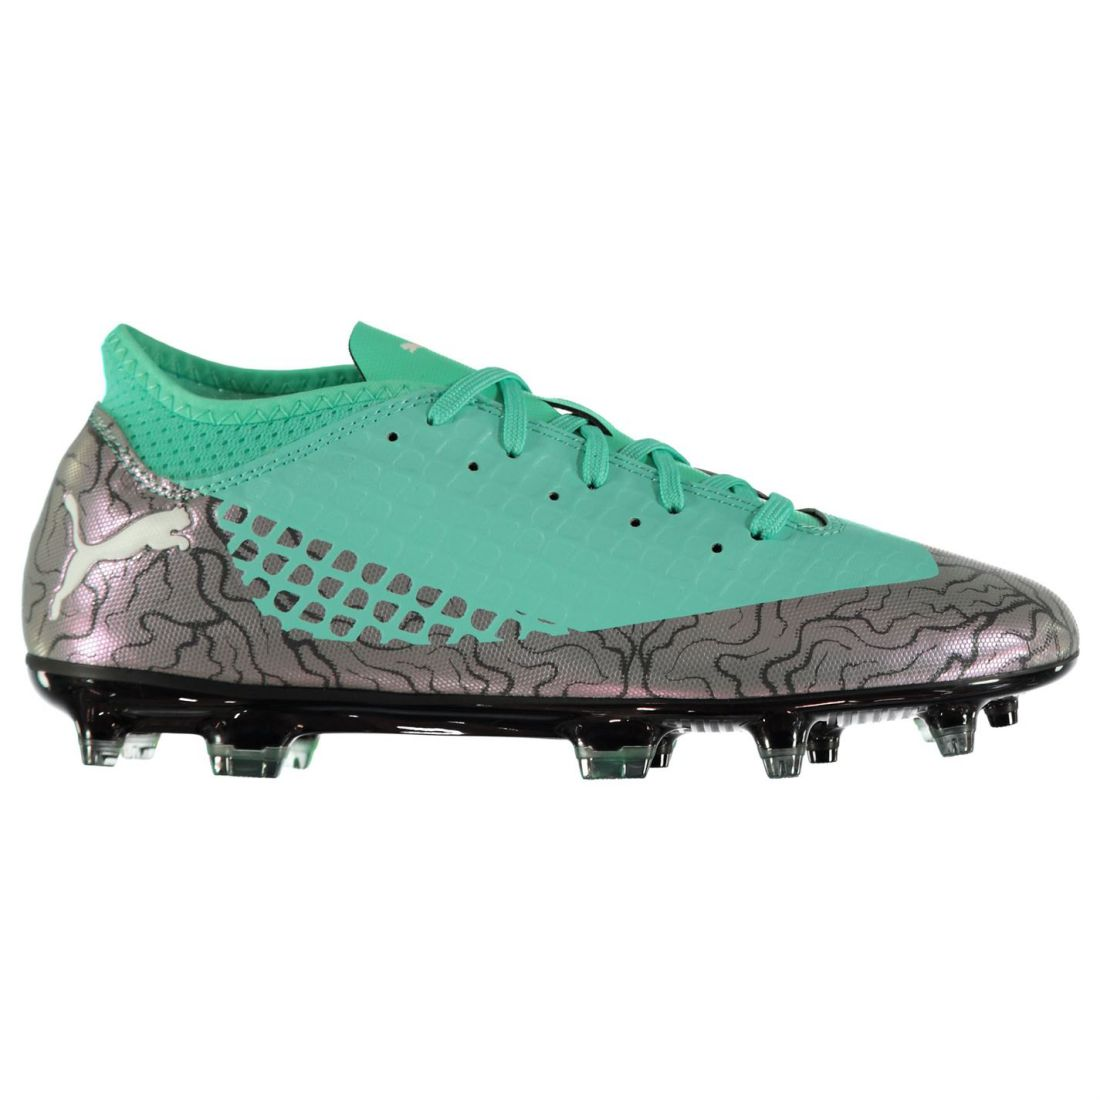 Puma Kids Future 2.4 Junior FG Football Boots Firm Ground Lace Up Studs Textured